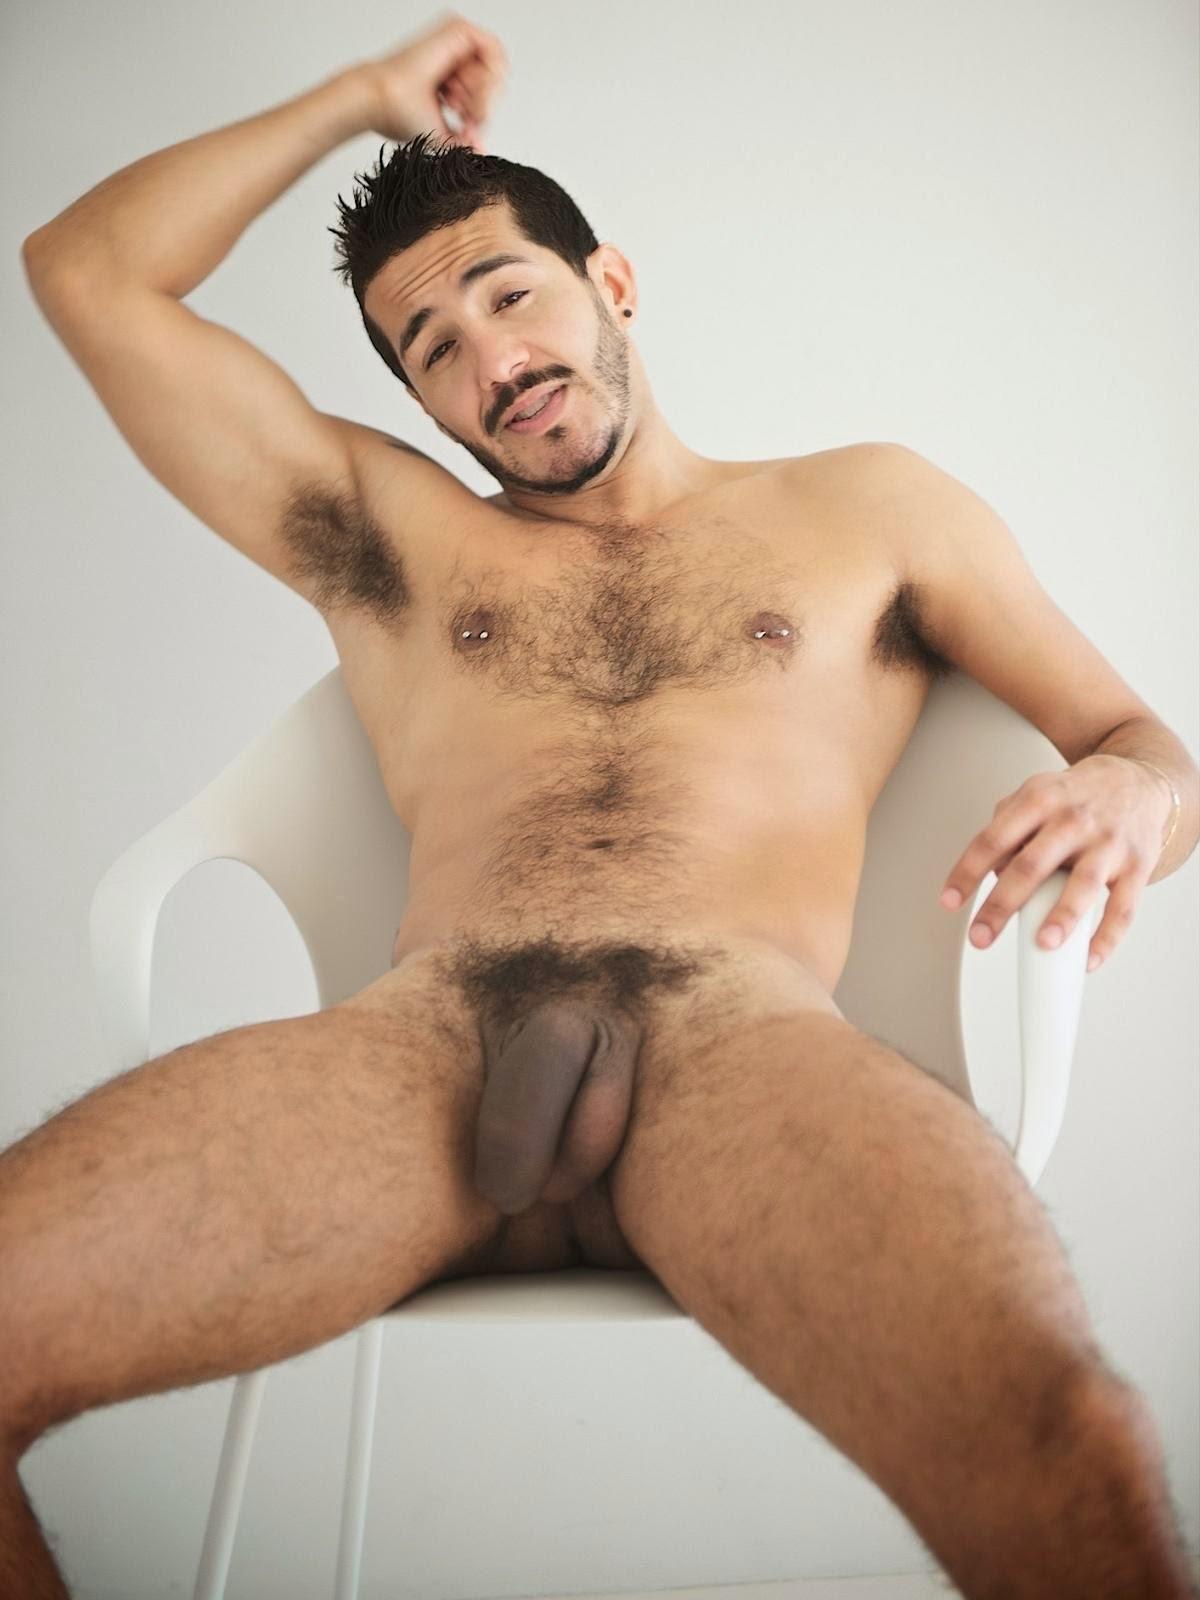 Average penis size flacid and average hispanic penis size shower curtain for sale by lokit toc